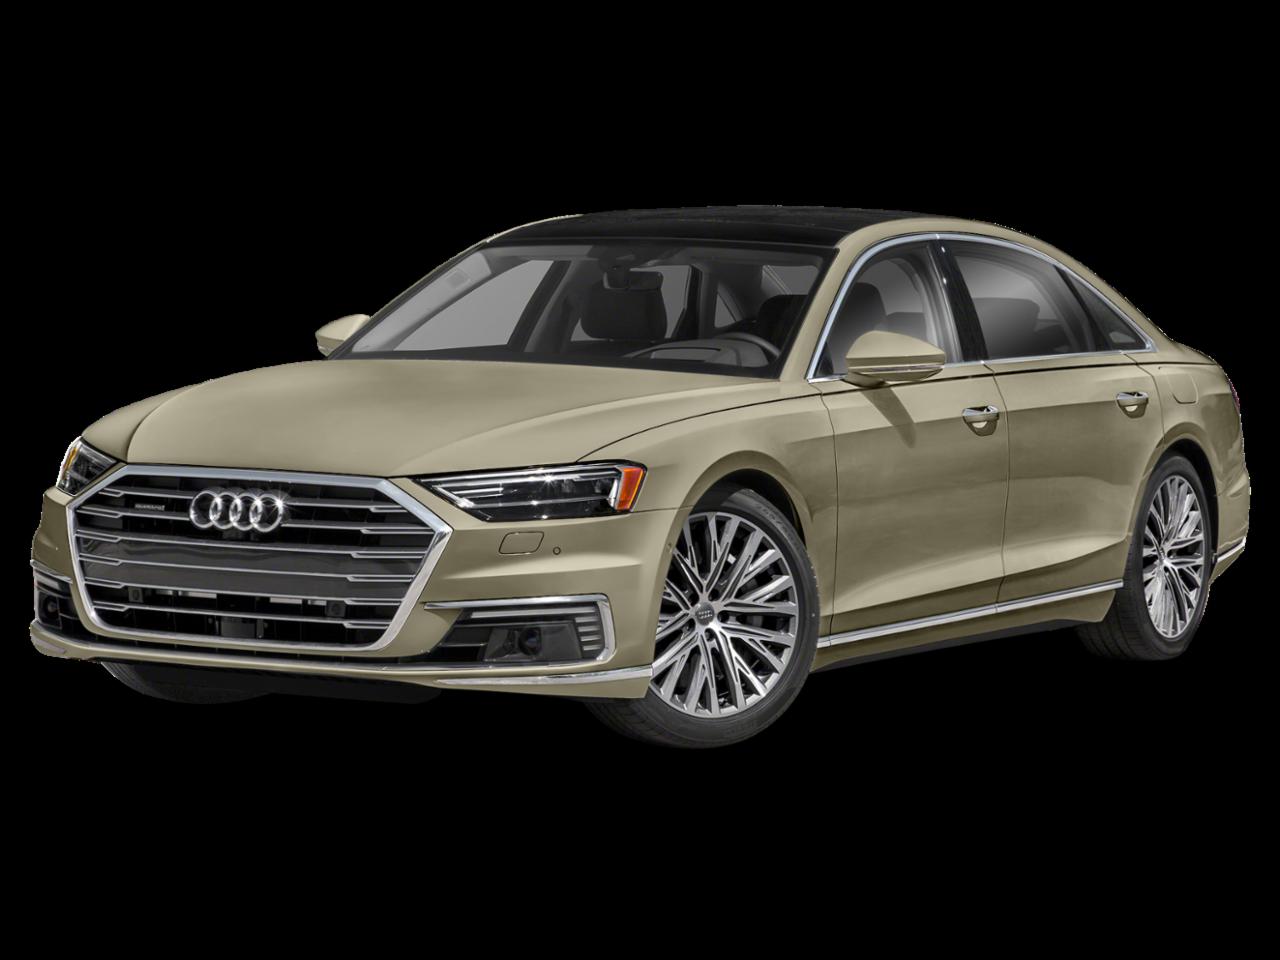 Audi 2021 A8 L 60 TFSI e quattro